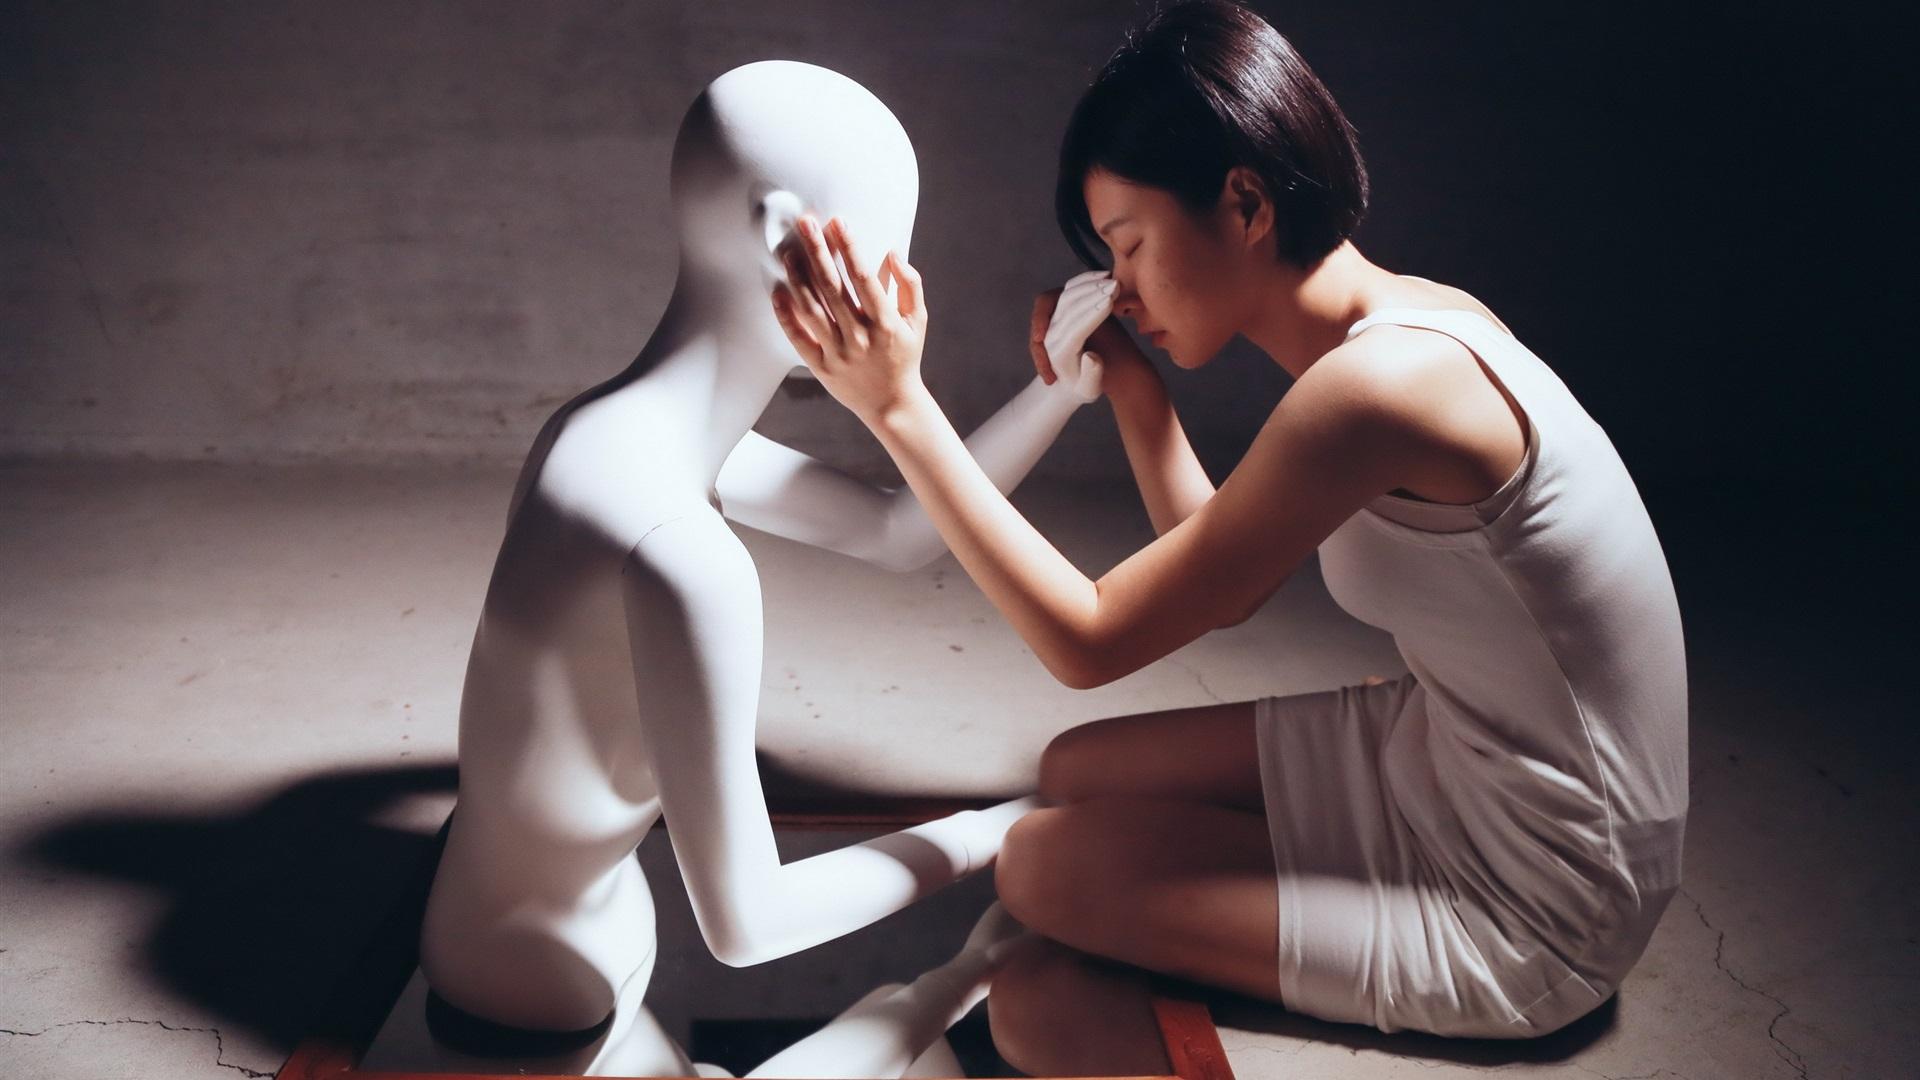 Wallpaper Short Hair Asian Girl And Model Mood 2560x1600 Hd